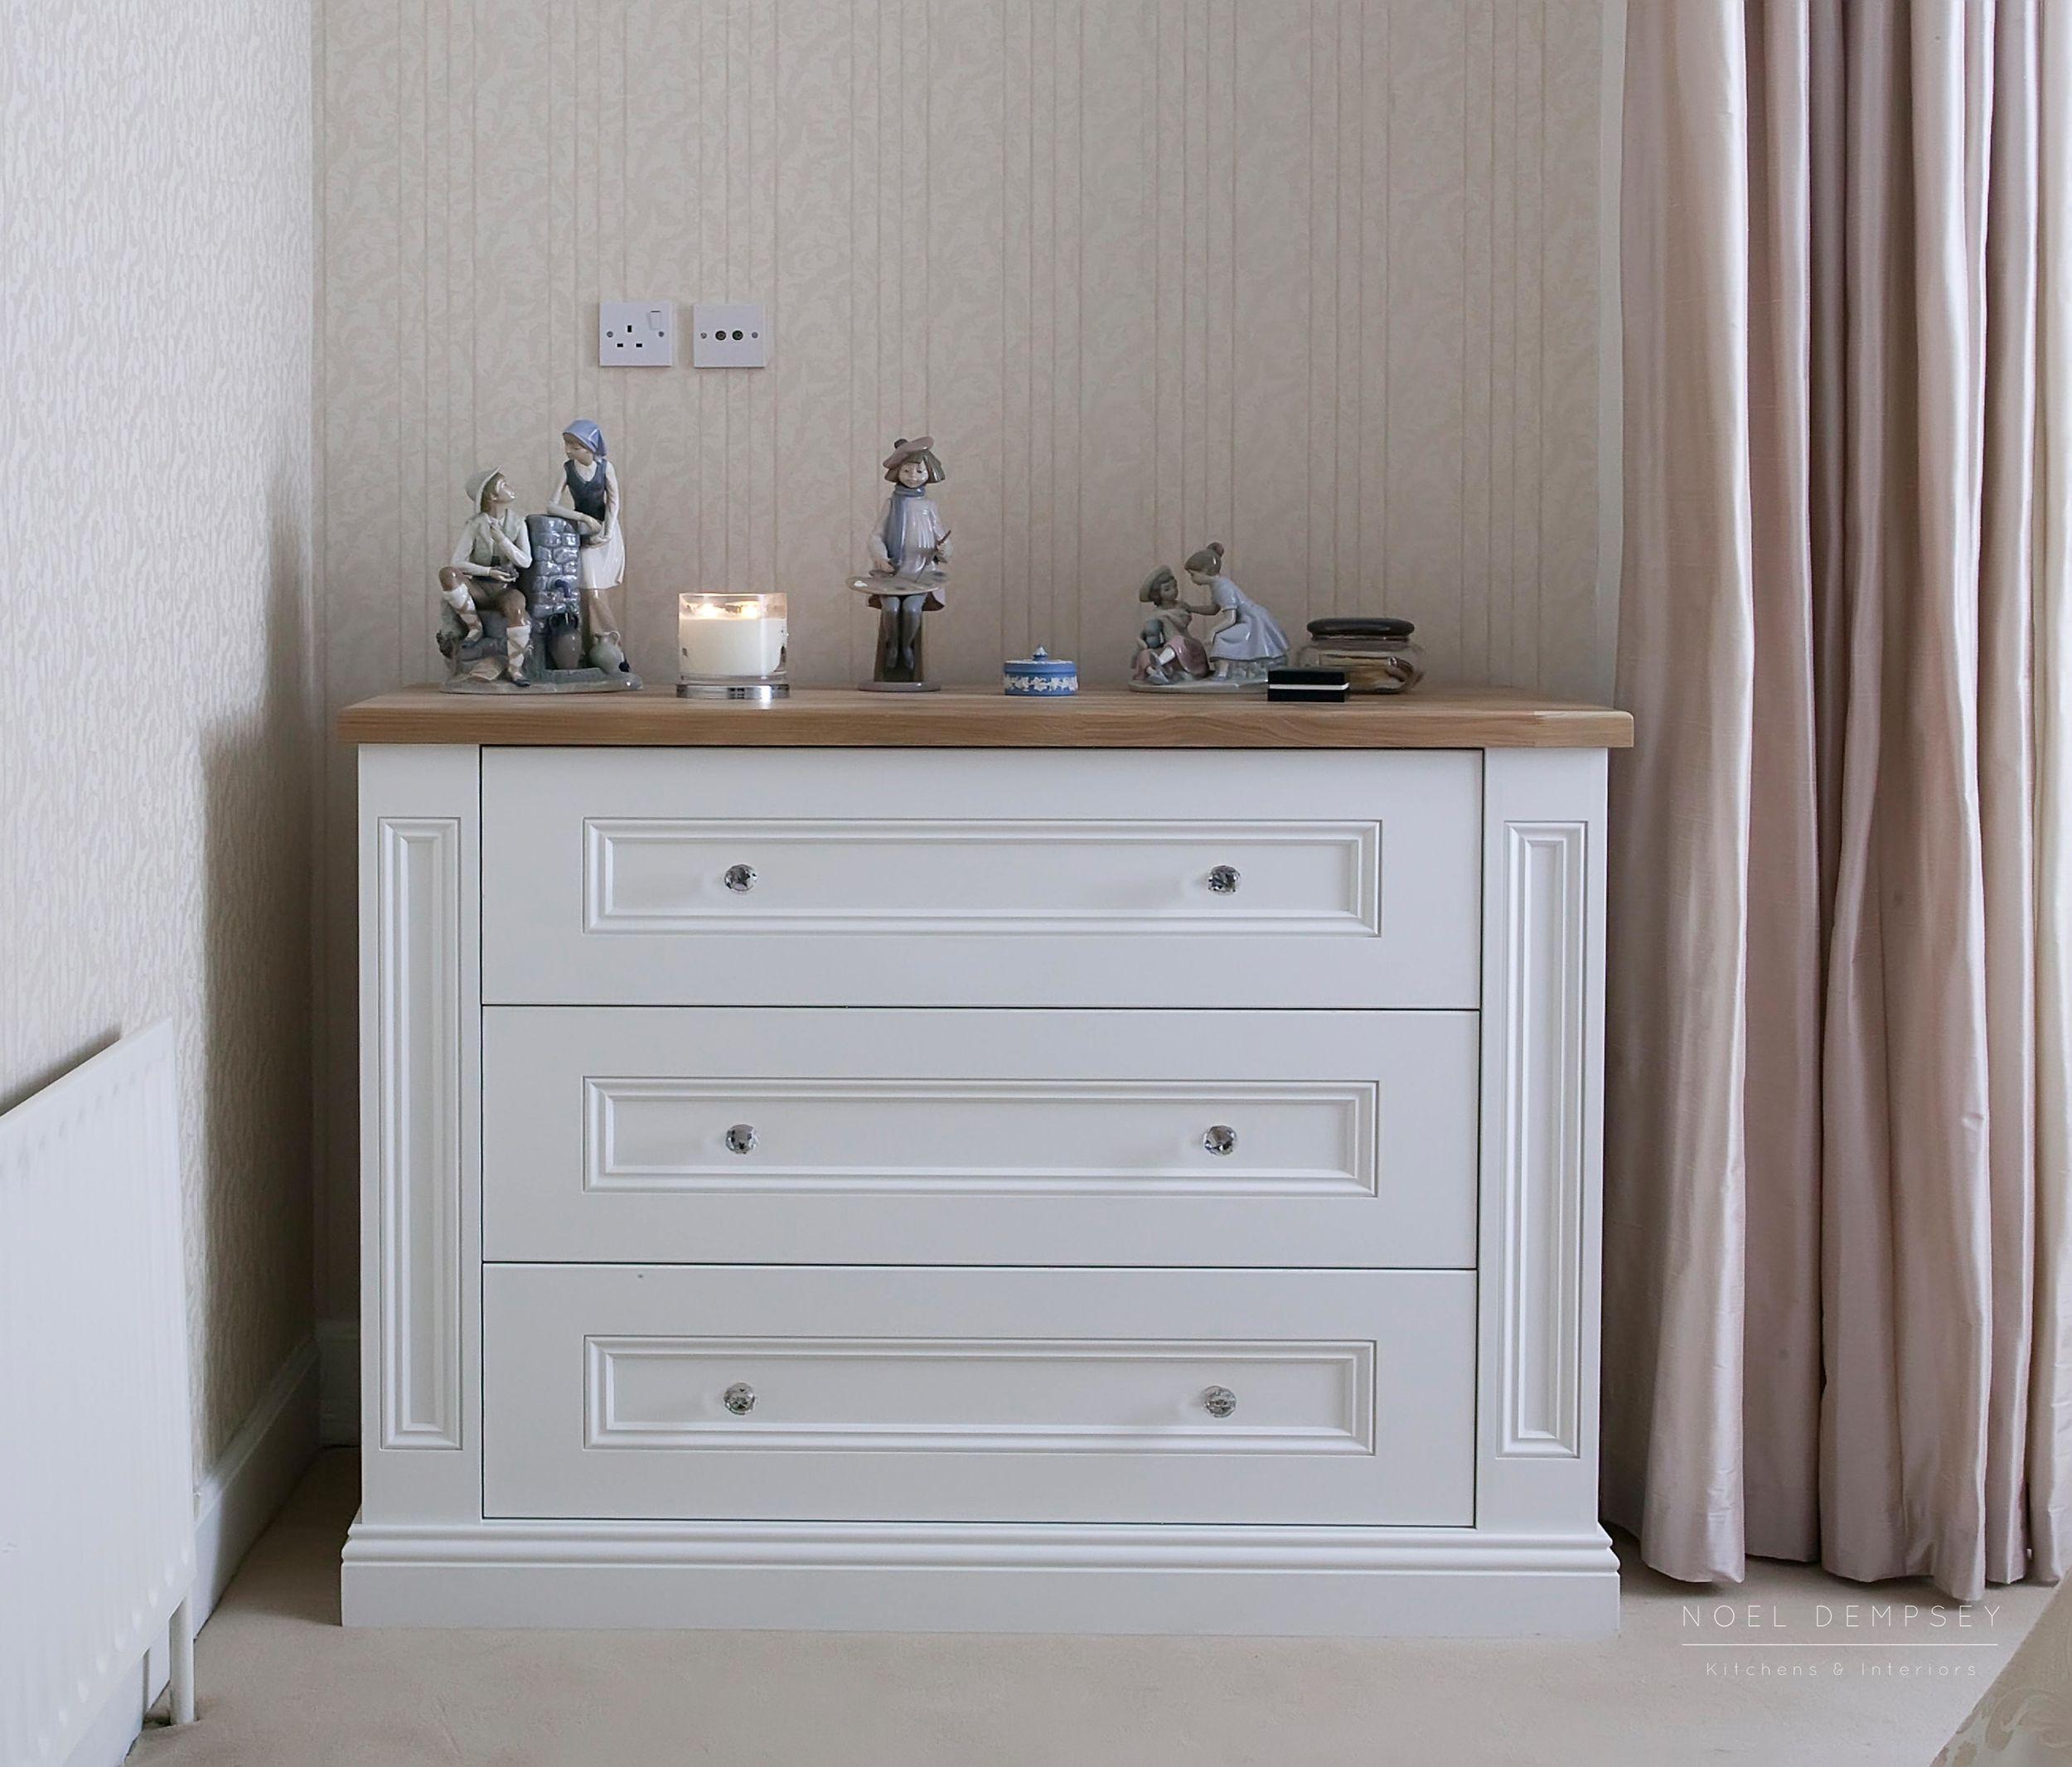 Morehampton-Painted-Wardrobe-Dublin-6.jpg